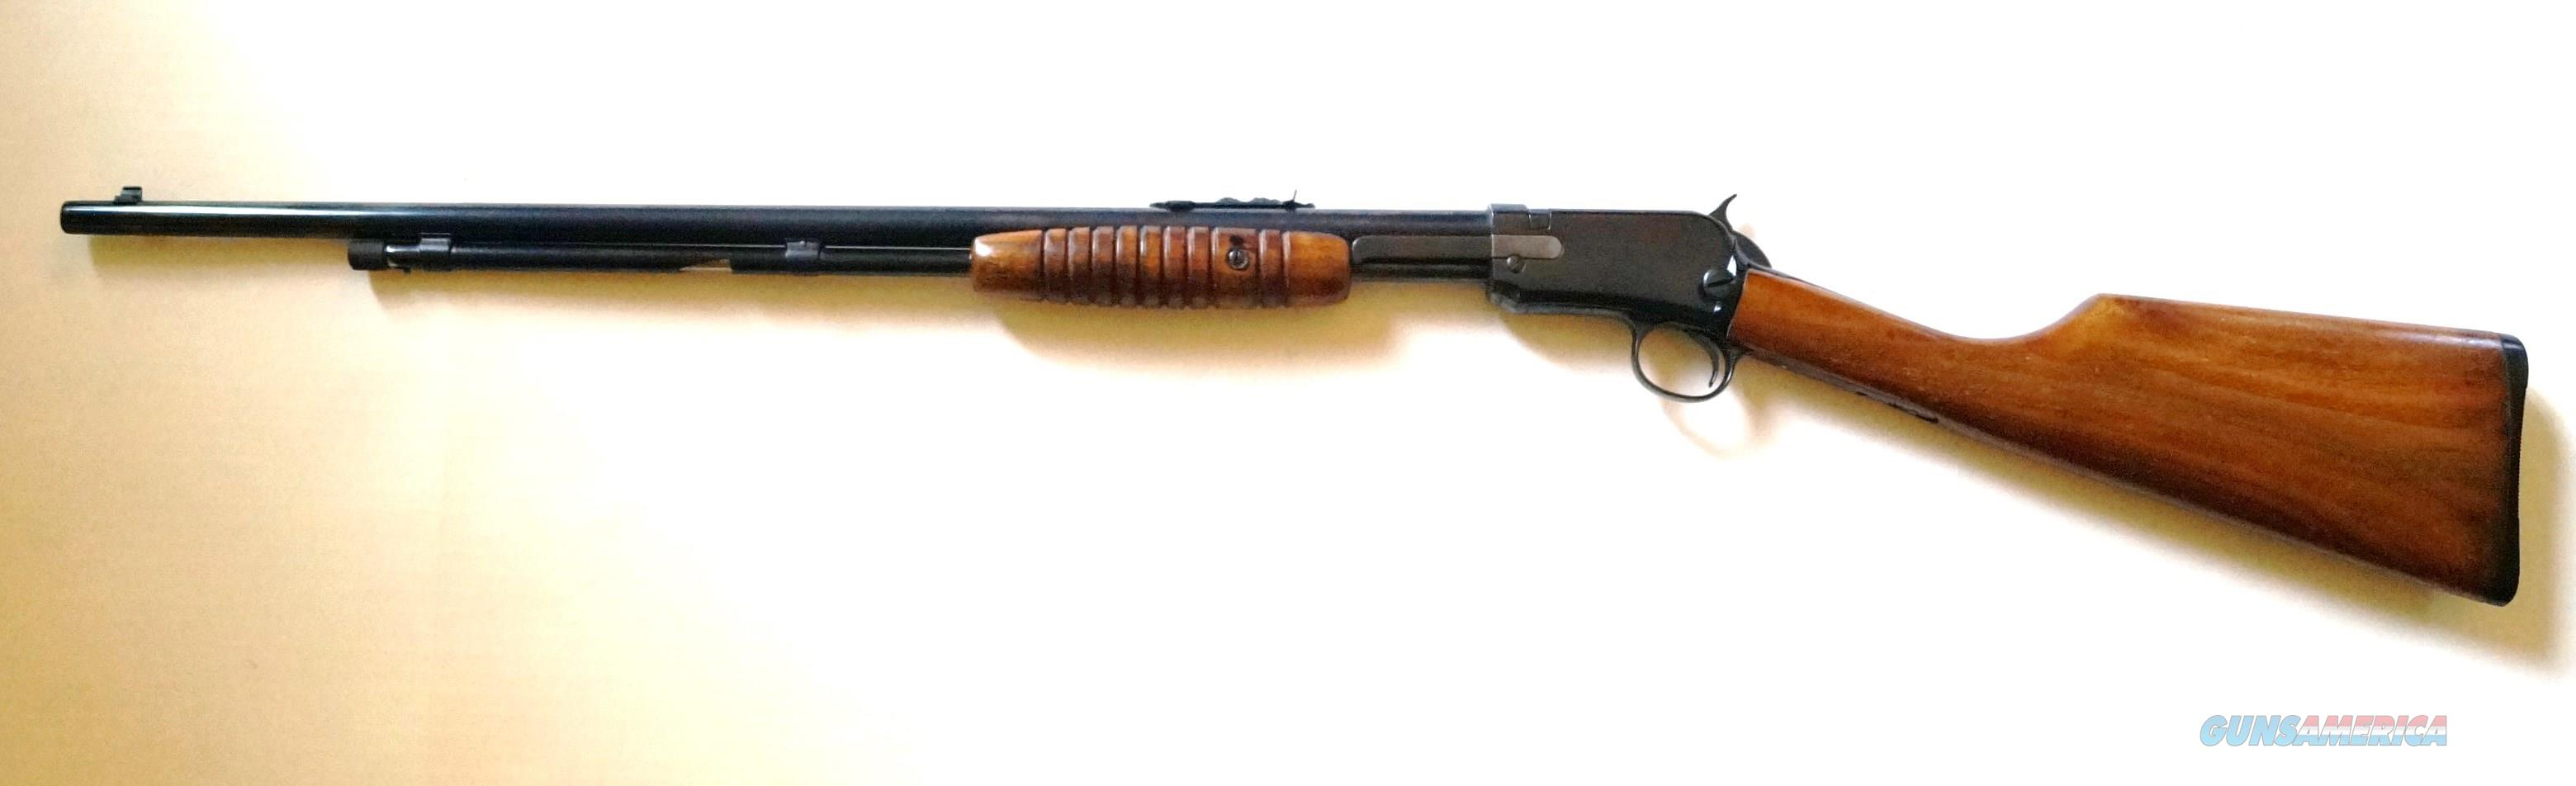 WINCHESTER MODEL 62, GALERY MODEL, .22 SHORT, TAKE DOWN MODEL  Guns > Rifles > Winchester Rifles - Modern Pump